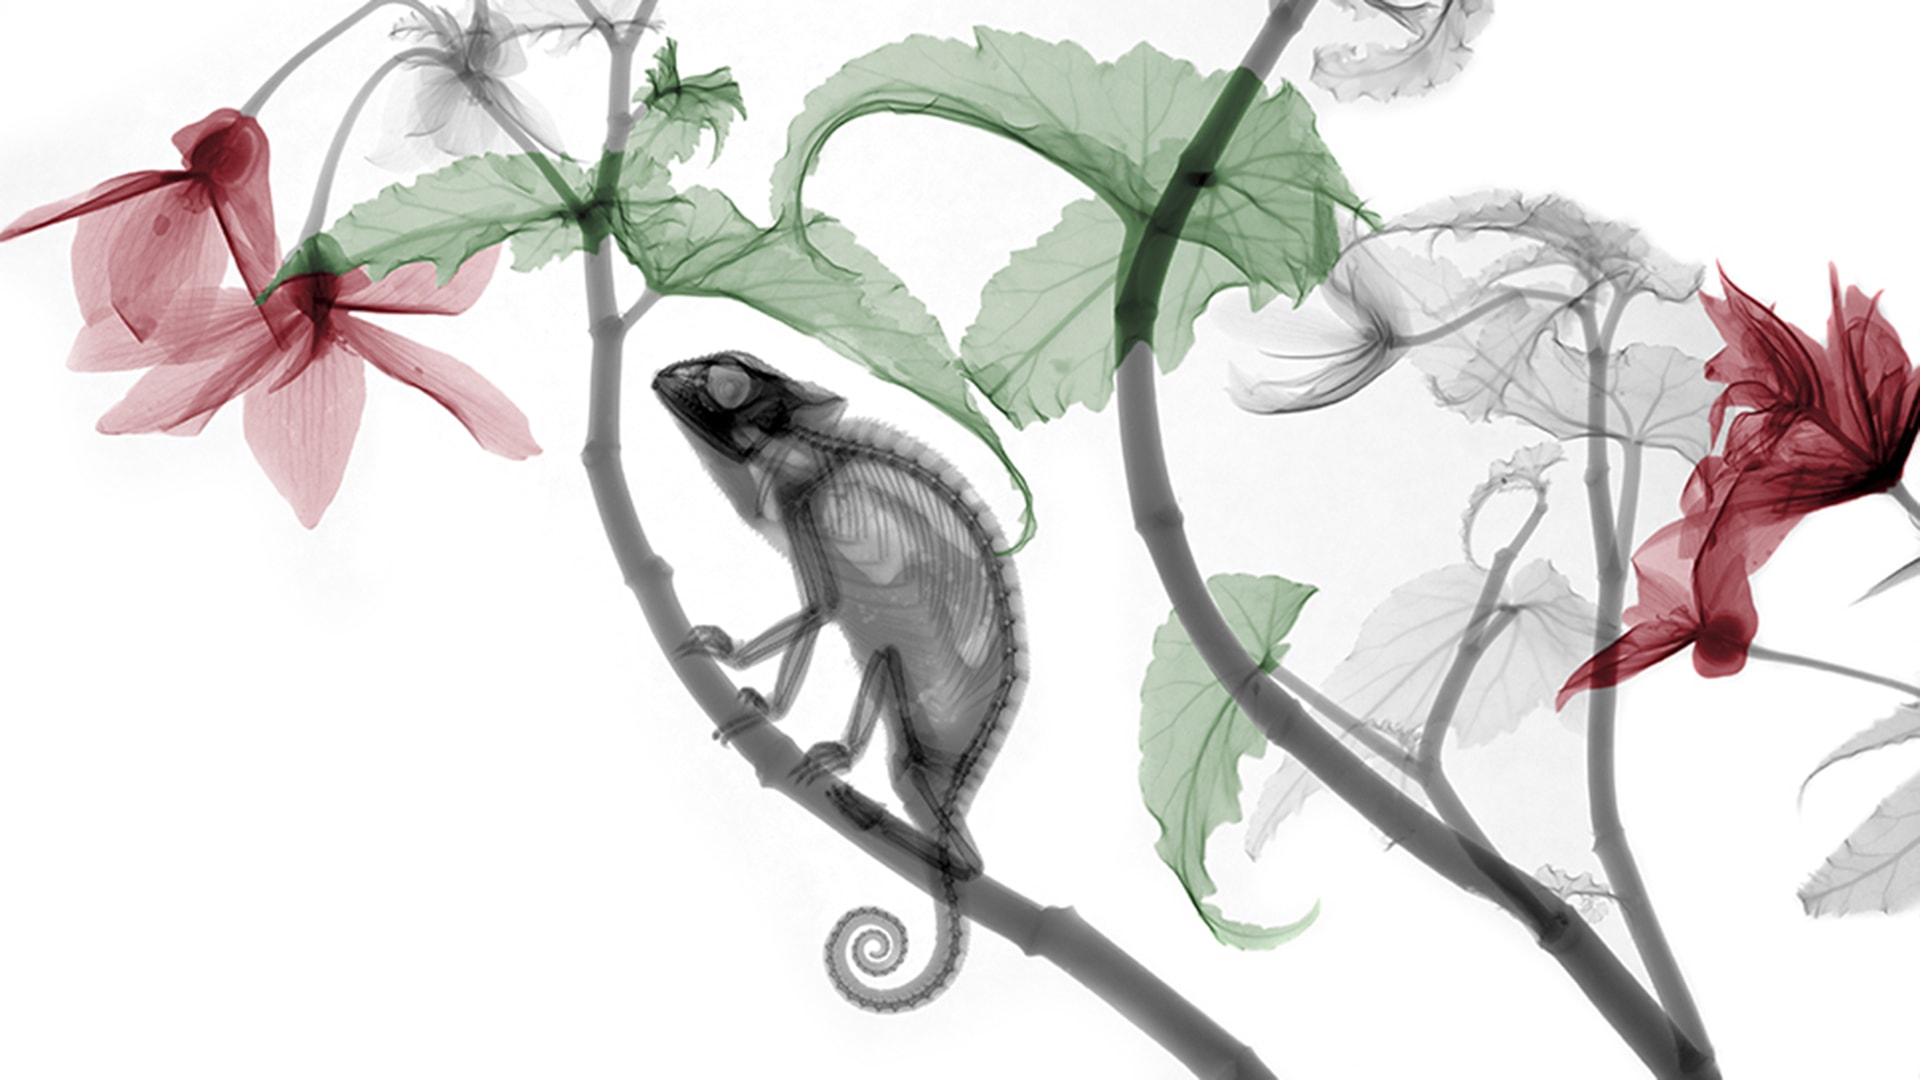 Chameleon, X-ray